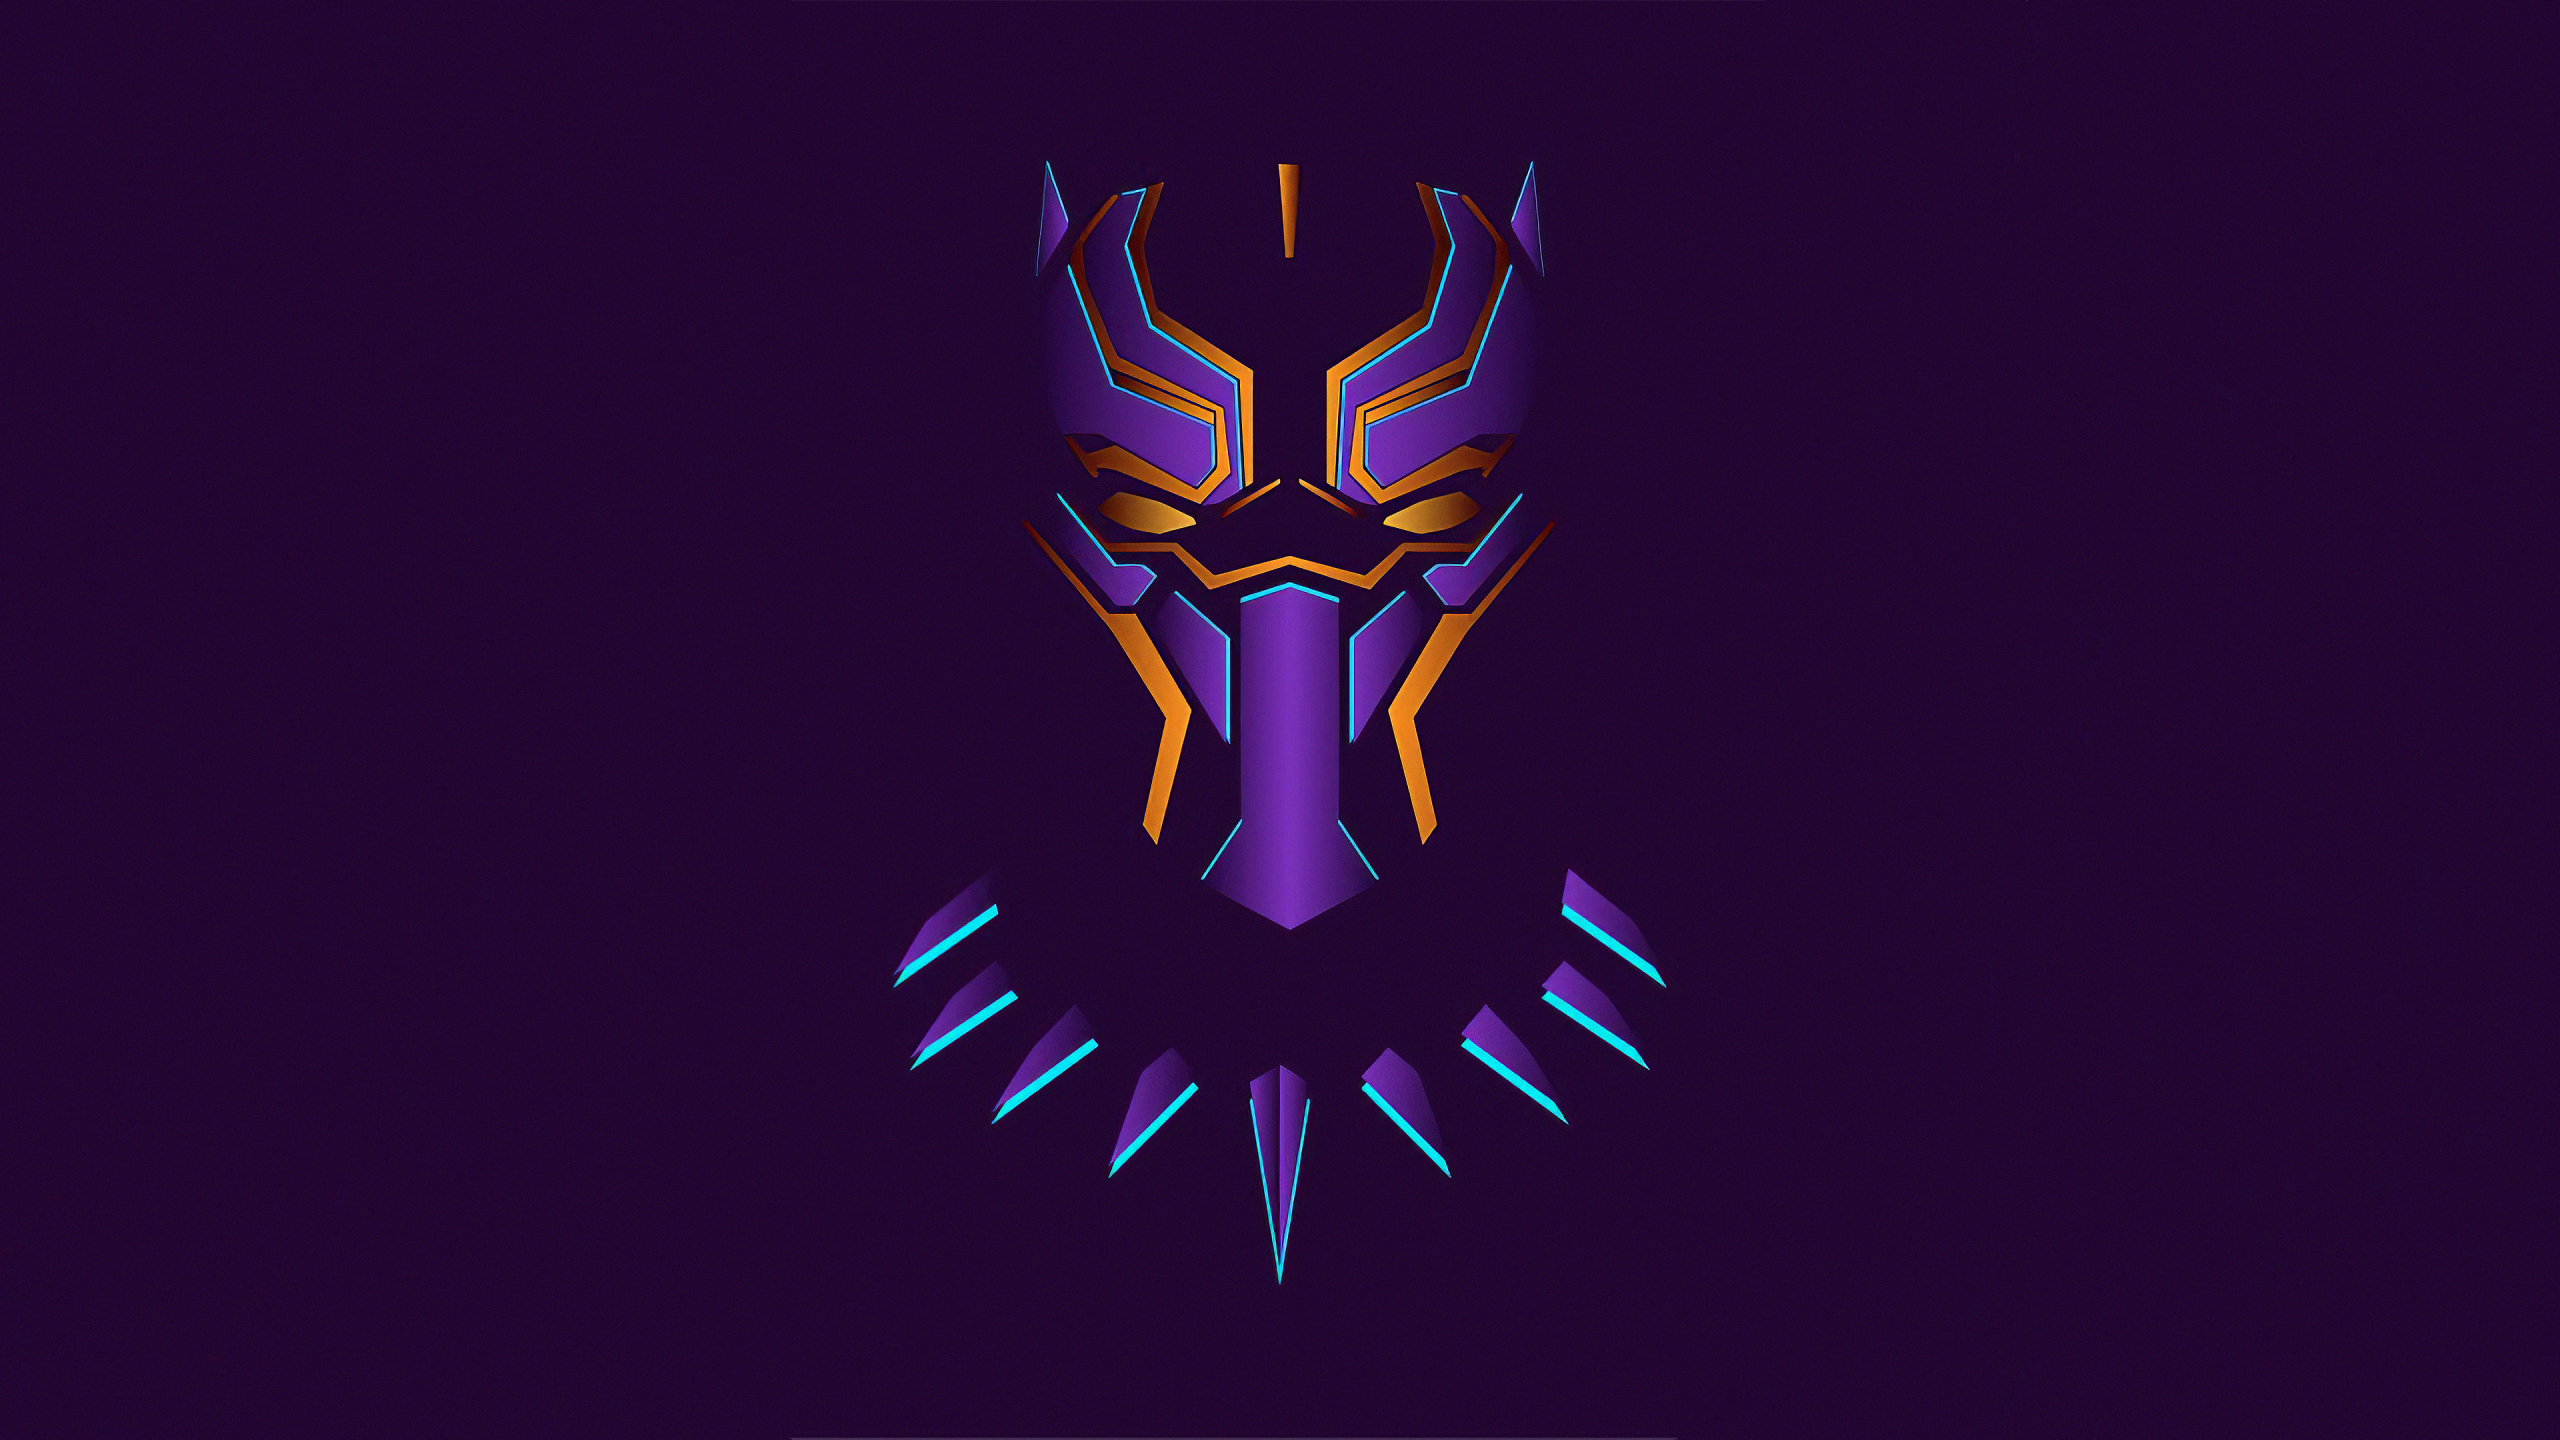 Ultra Hd Black Panther 3d Wallpaper – WallpaperShit